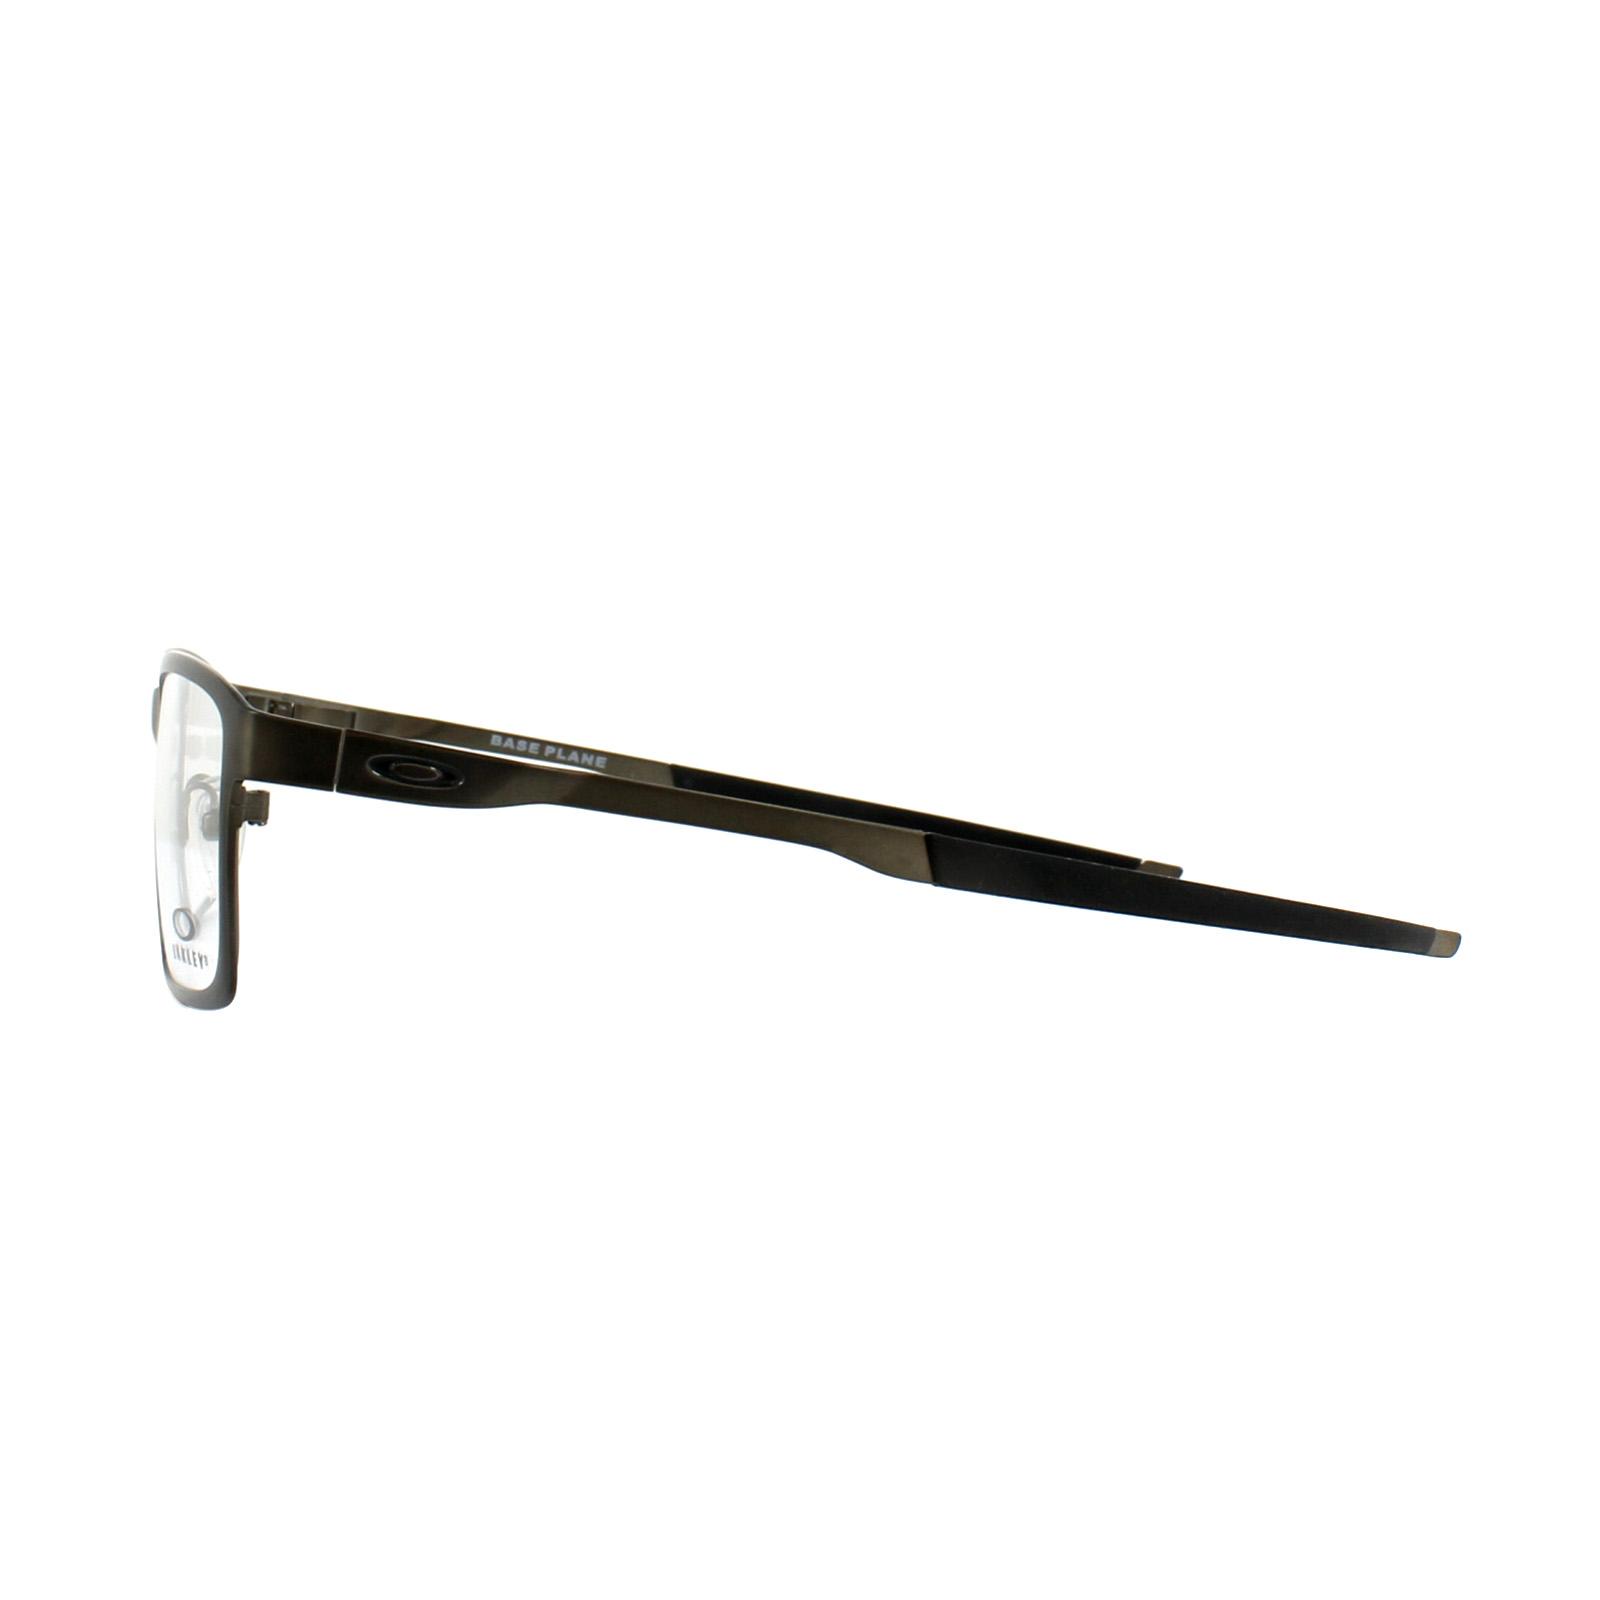 12bb60d3a5 Cheap Oakley Base Plane Glasses Frames - Discounted Sunglasses